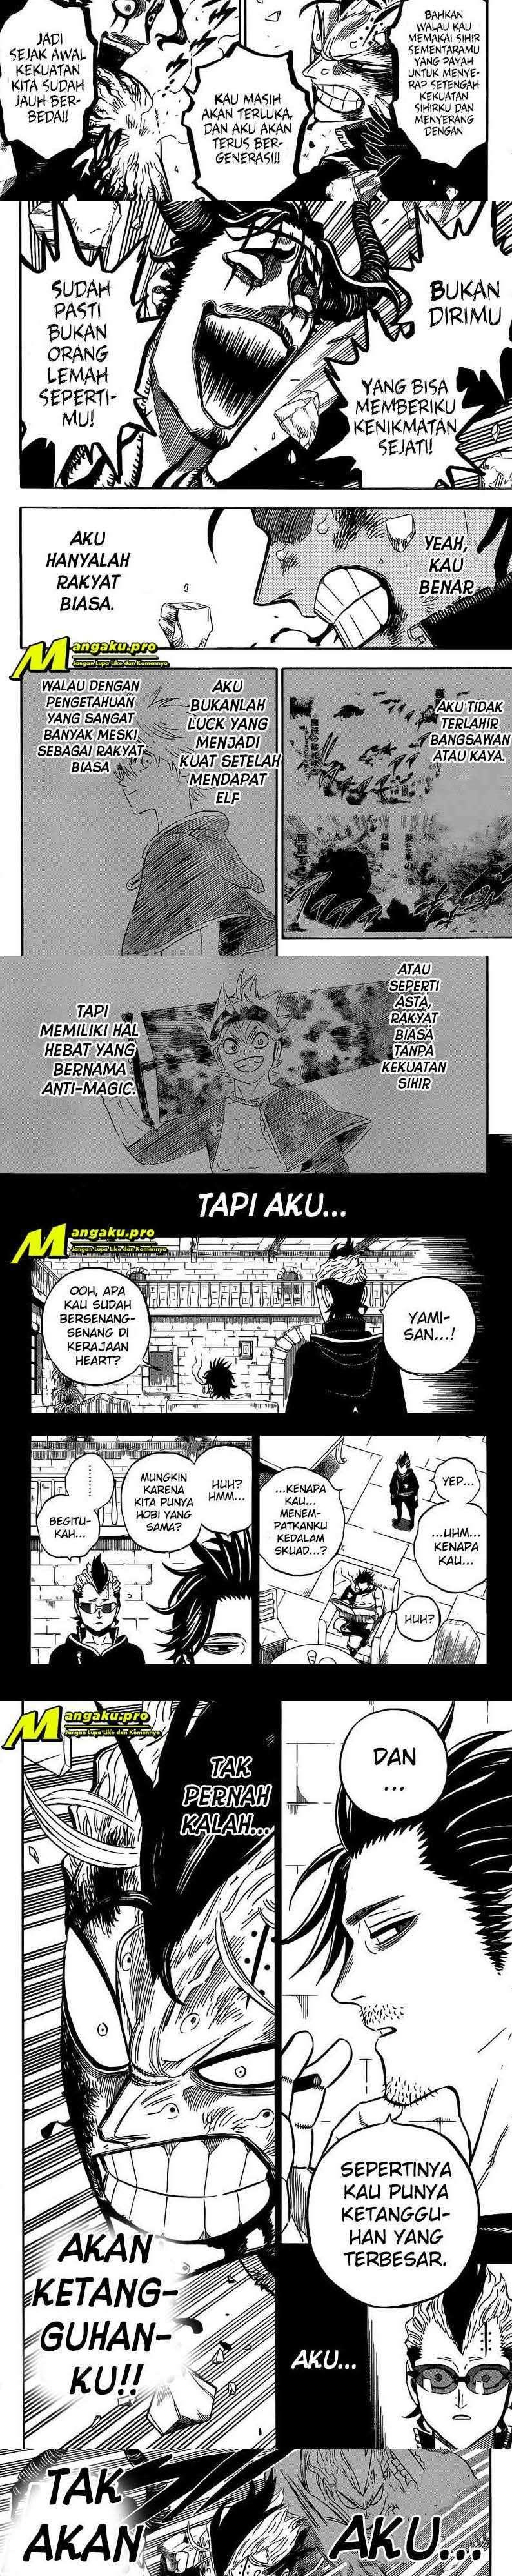 Black Clover Chapter 293 - Komik Terbaru